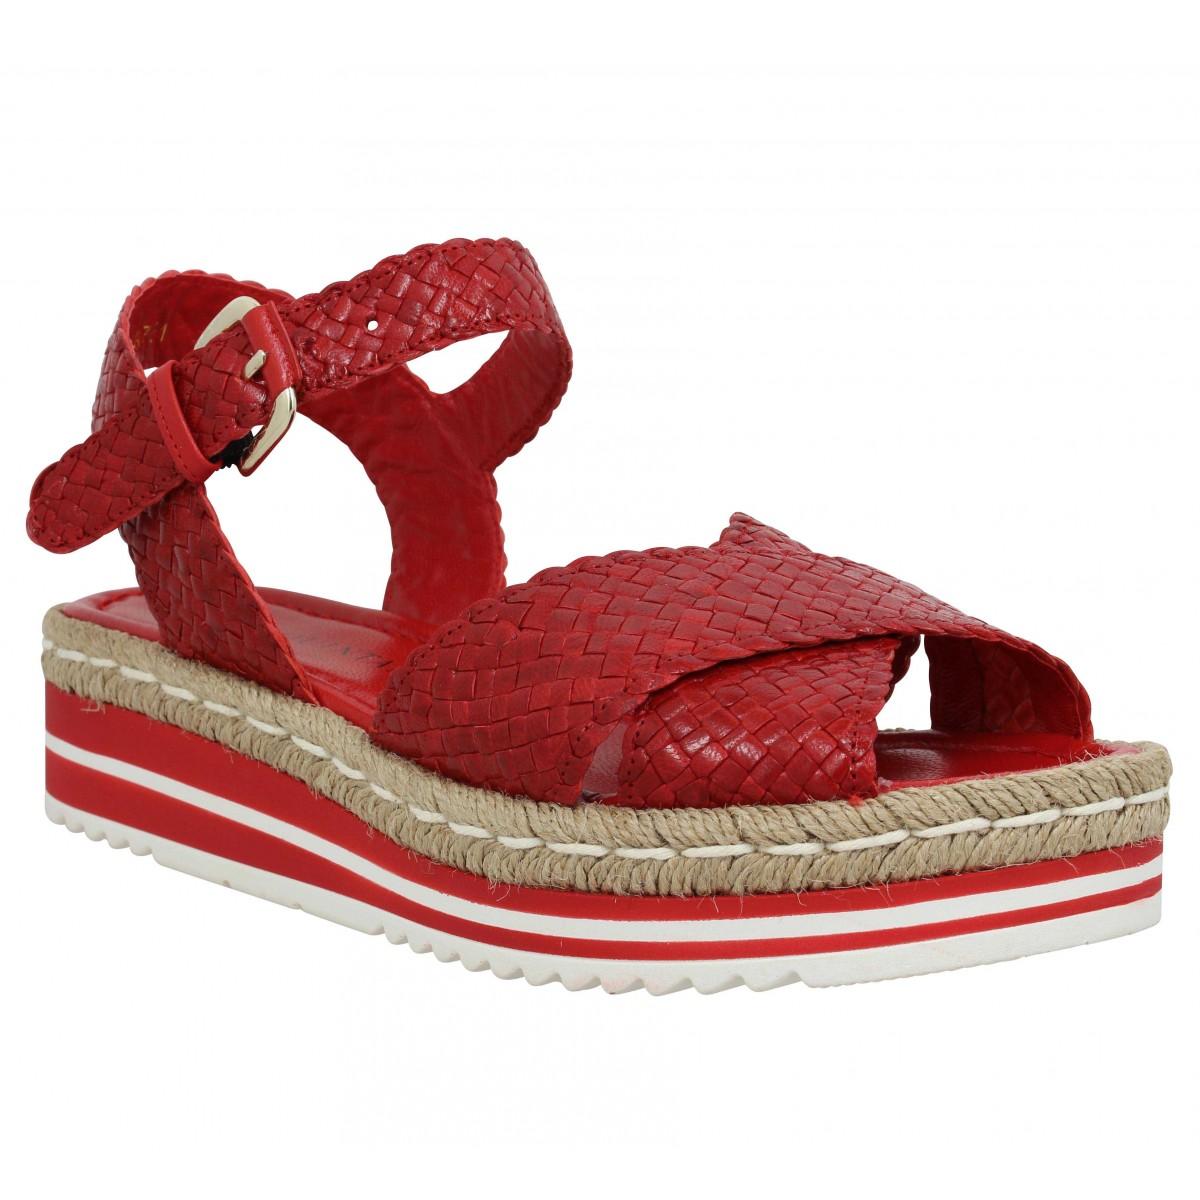 Nu-pieds PONS QUINTANA 7666 cuir Femme Rouge